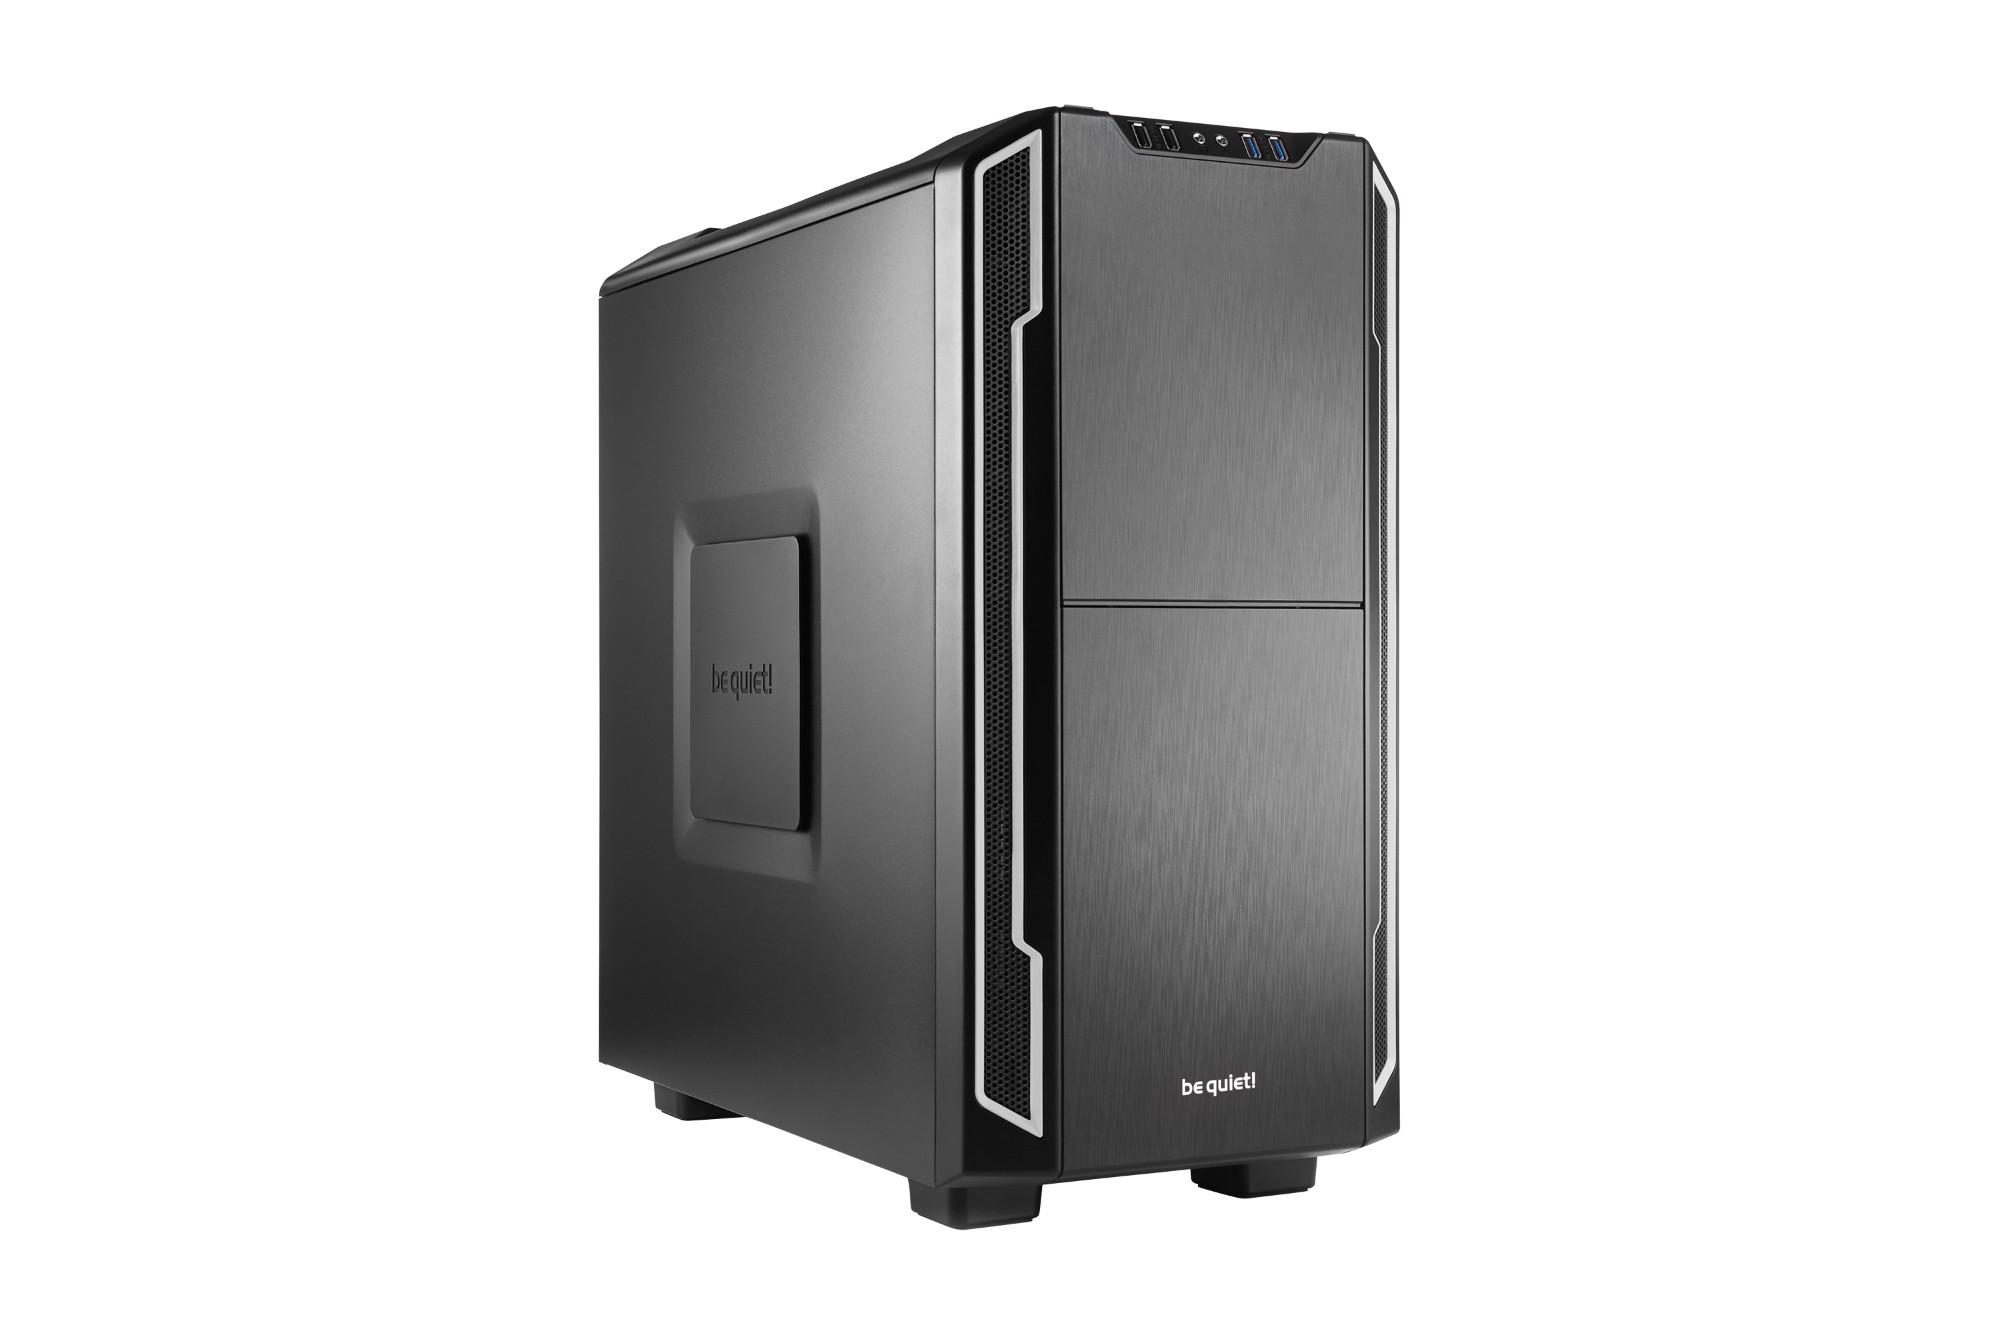 be quiet! Silent Base 600 Midi ATX Tower Black,Silver